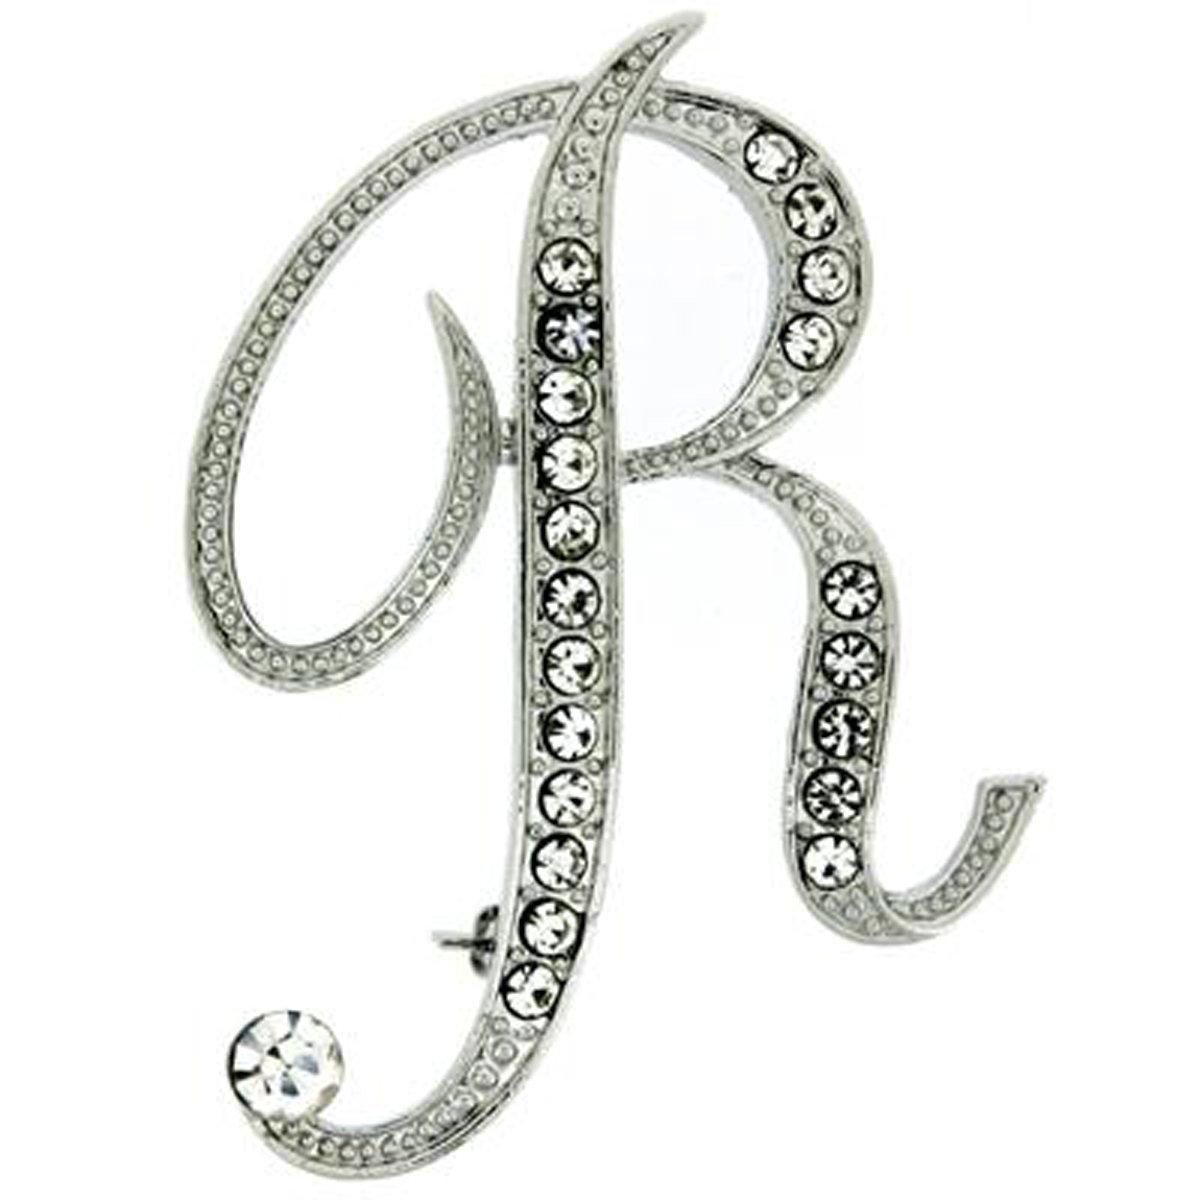 Pynk Jewellery Initiale Lettre R Cristal Swarovski Broche 2524